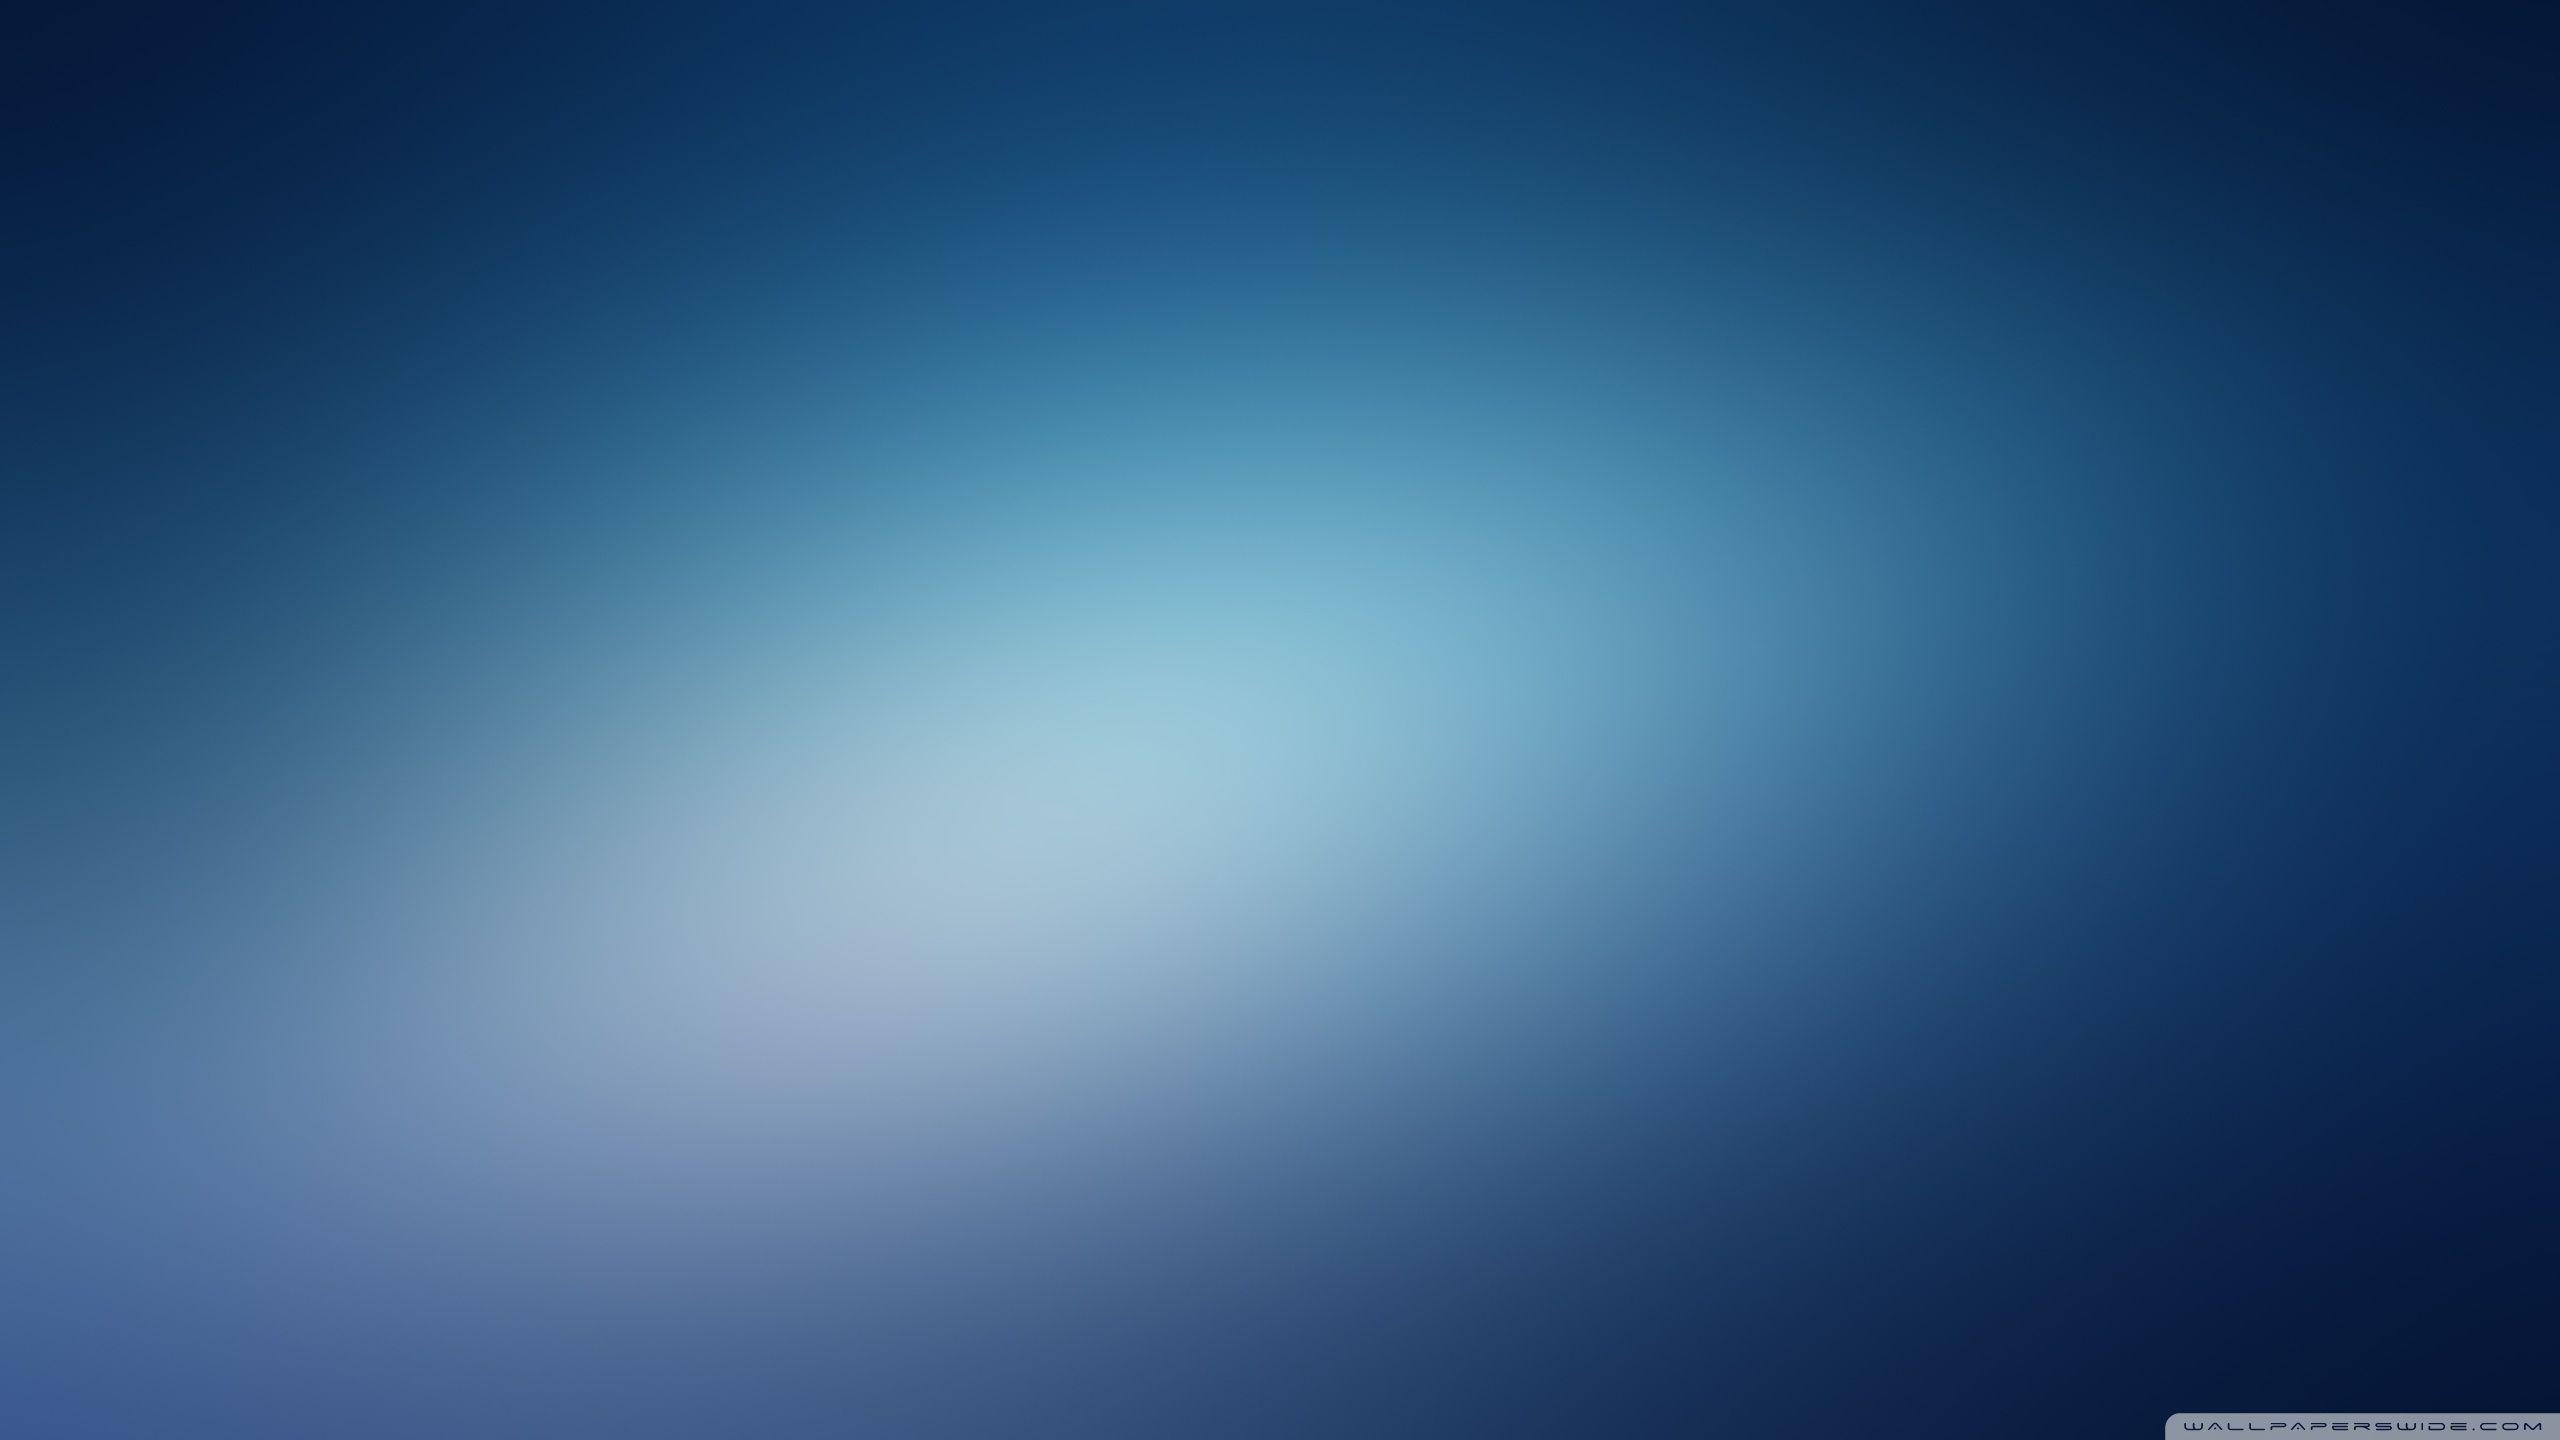 blurry blue background ii hd desktop wallpaper high definition